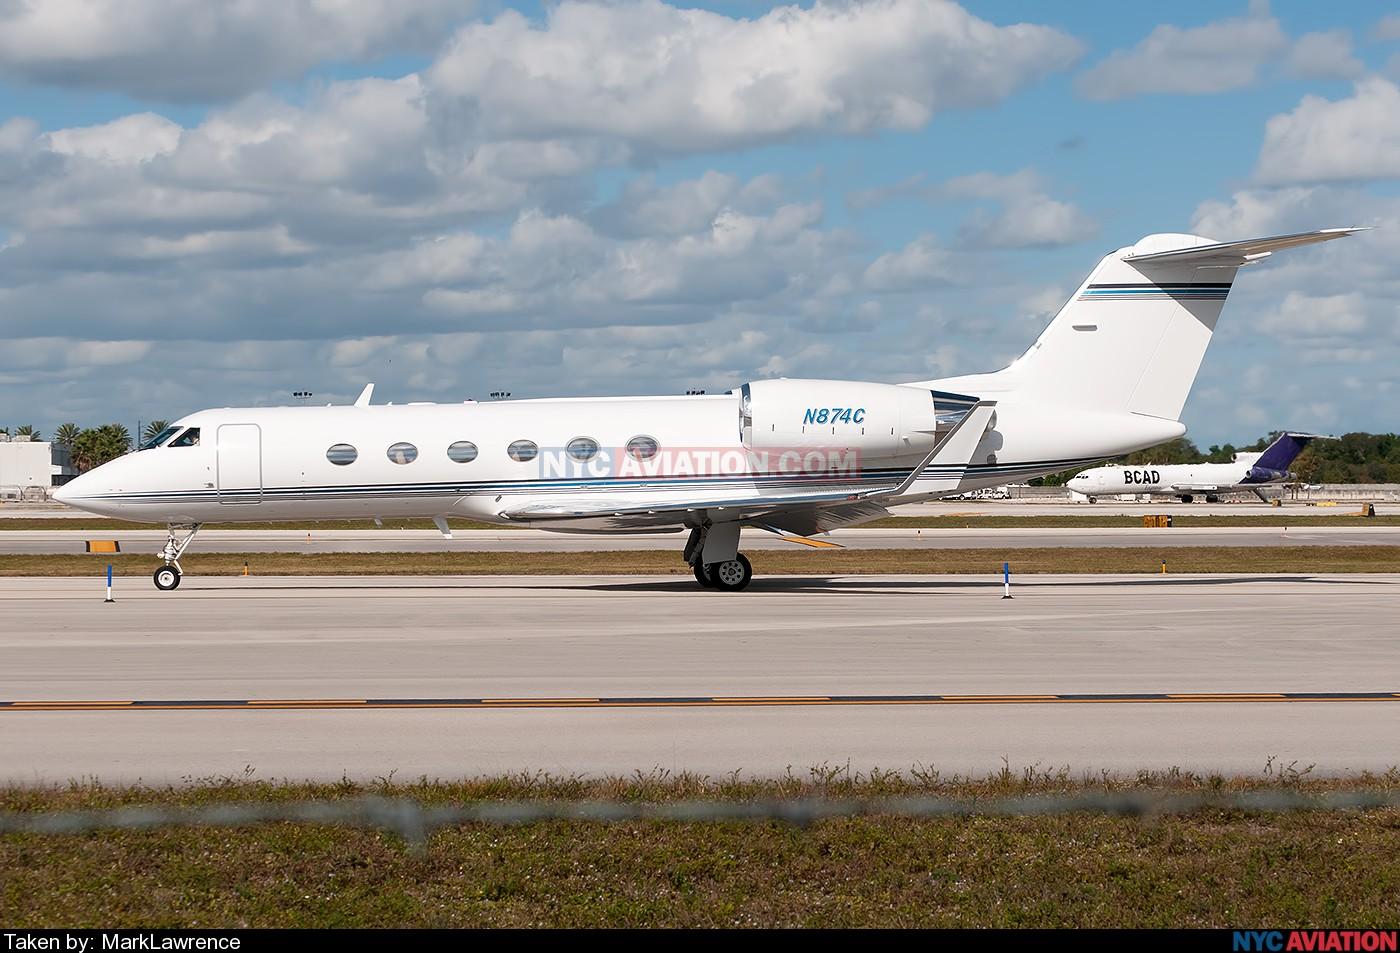 7mivpercOM-Gulfstream-N874C-KFLL-12072018.jpg